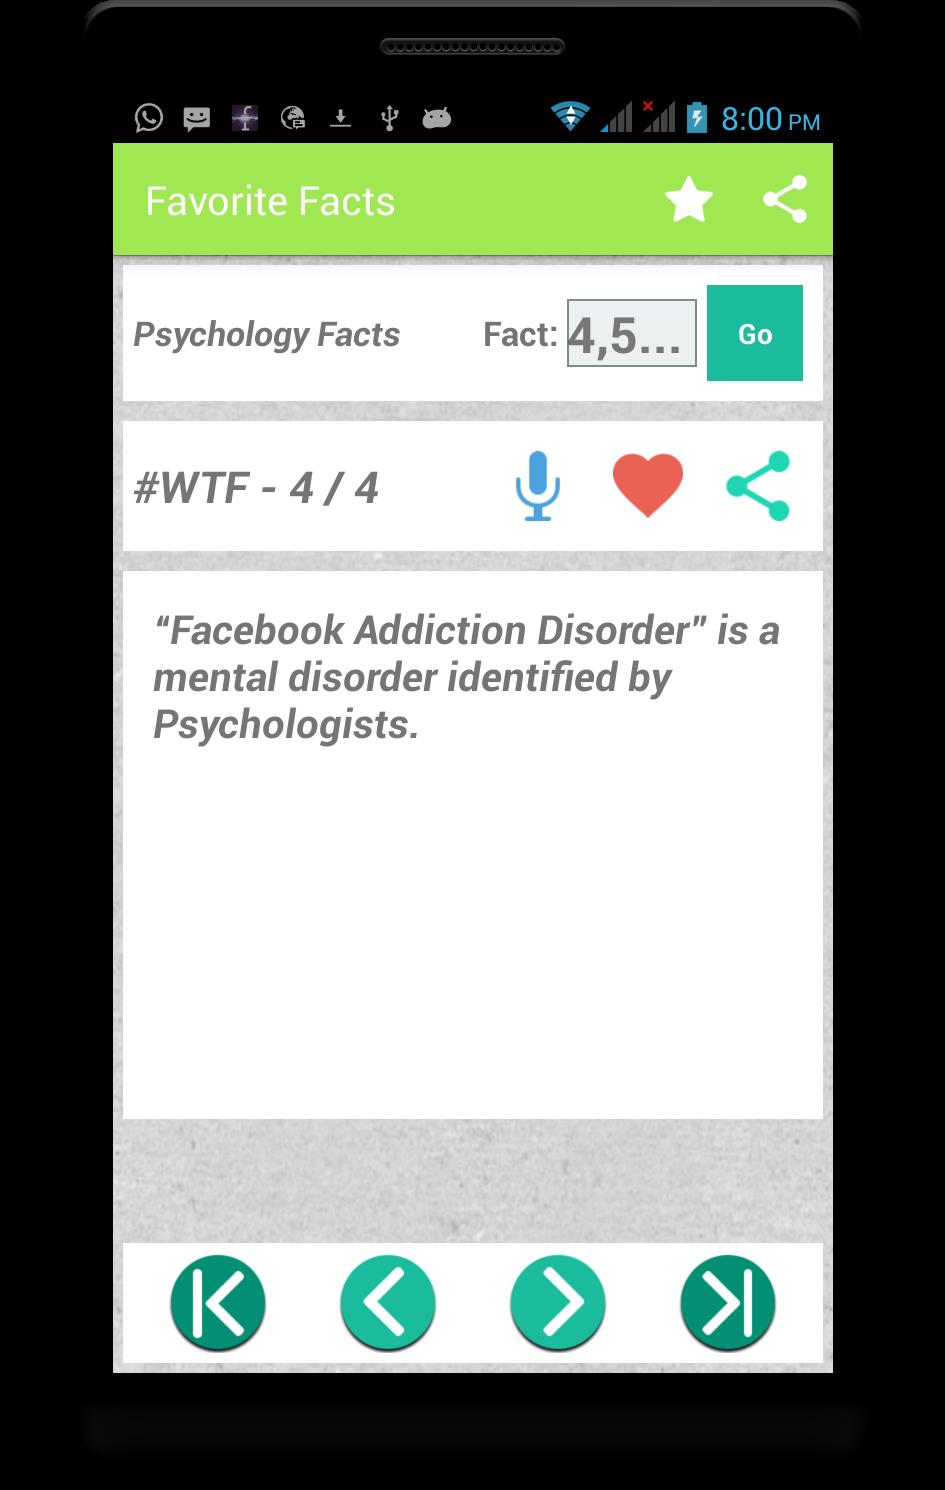 CfactWorld - Best Facts App